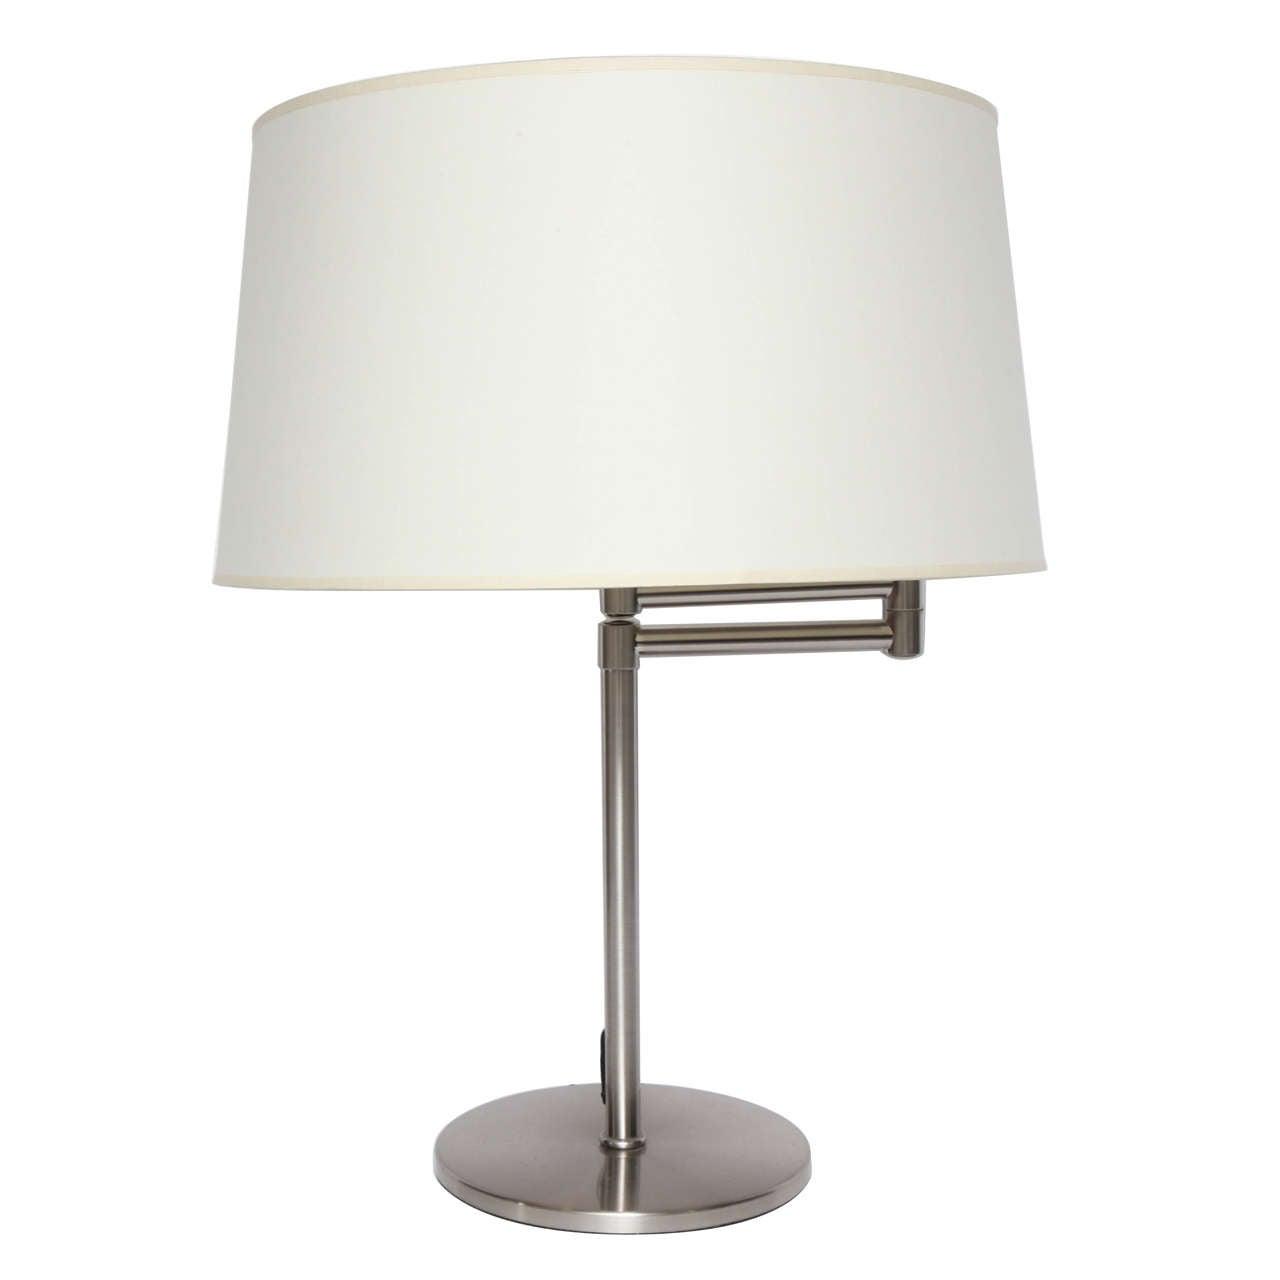 Brushed Metal Swing Arm Desk Lamp